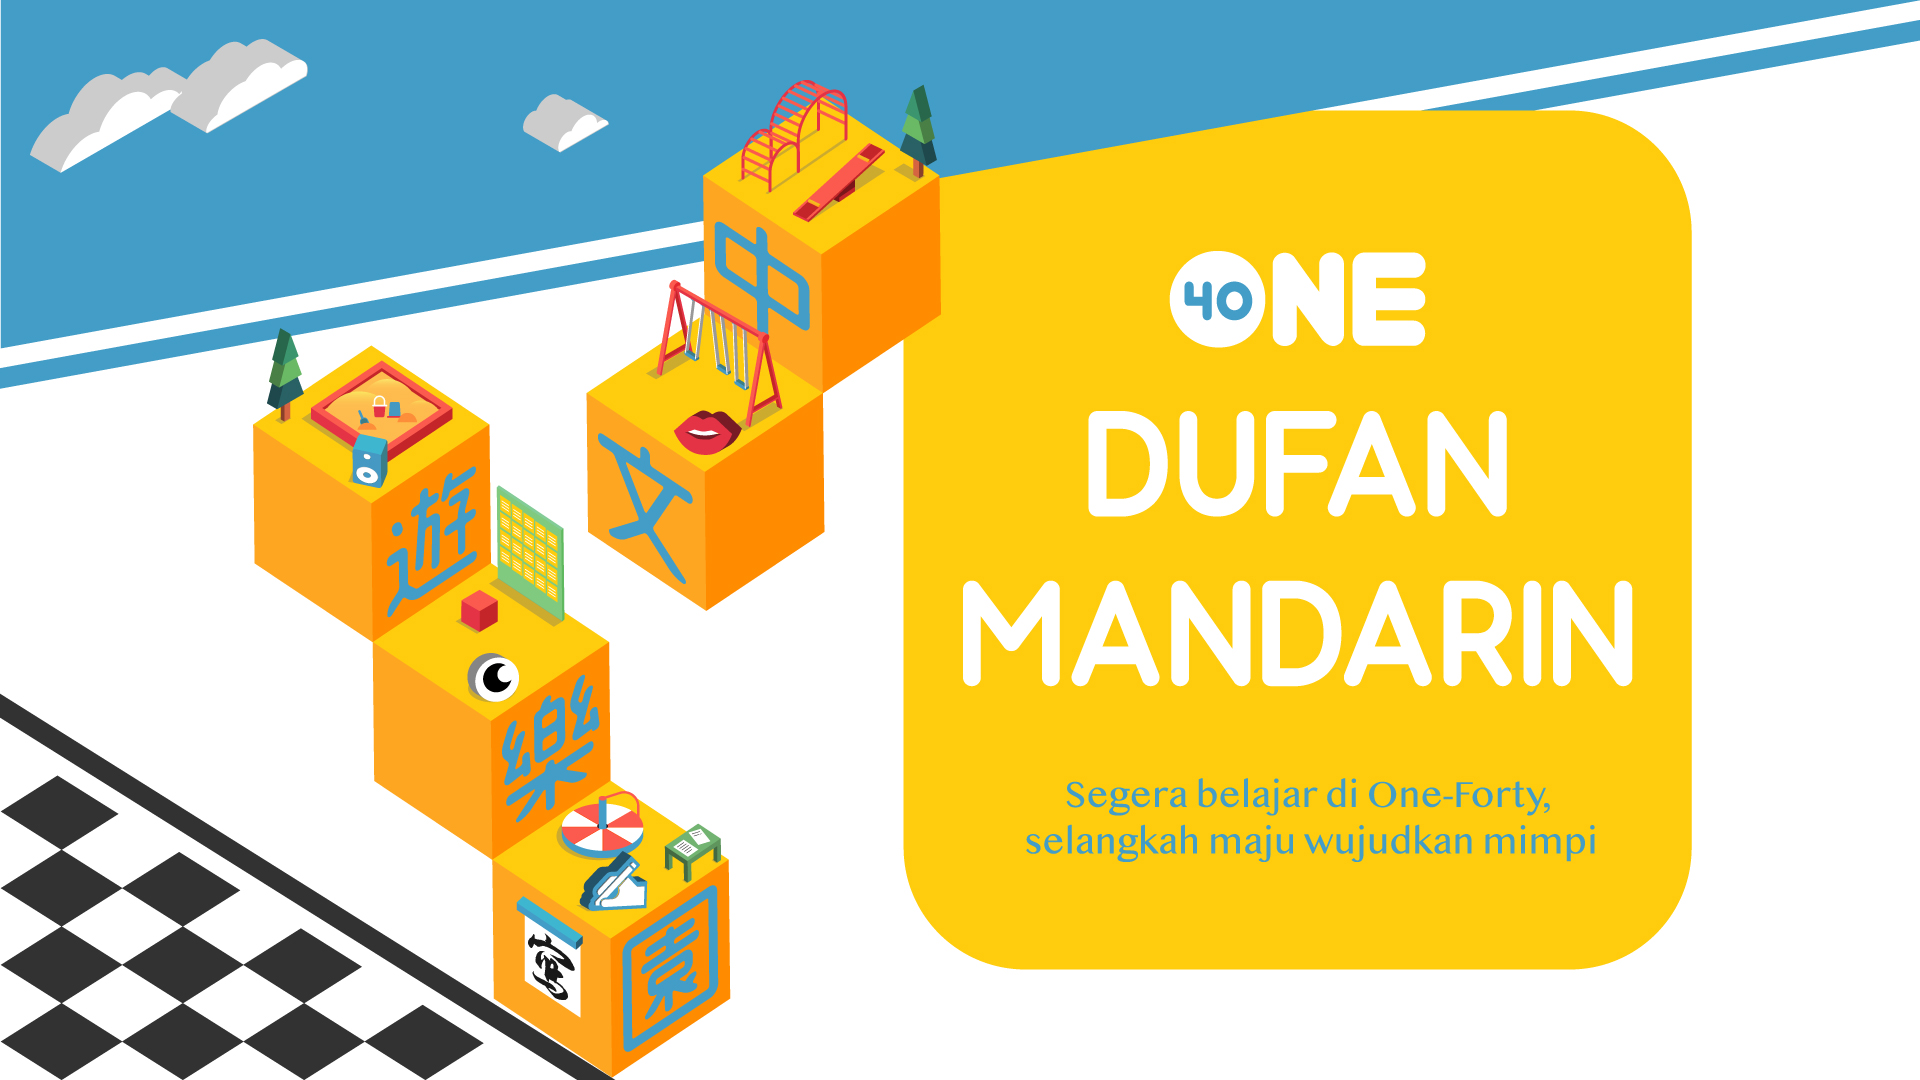 One-forty Dufan Mandarin -